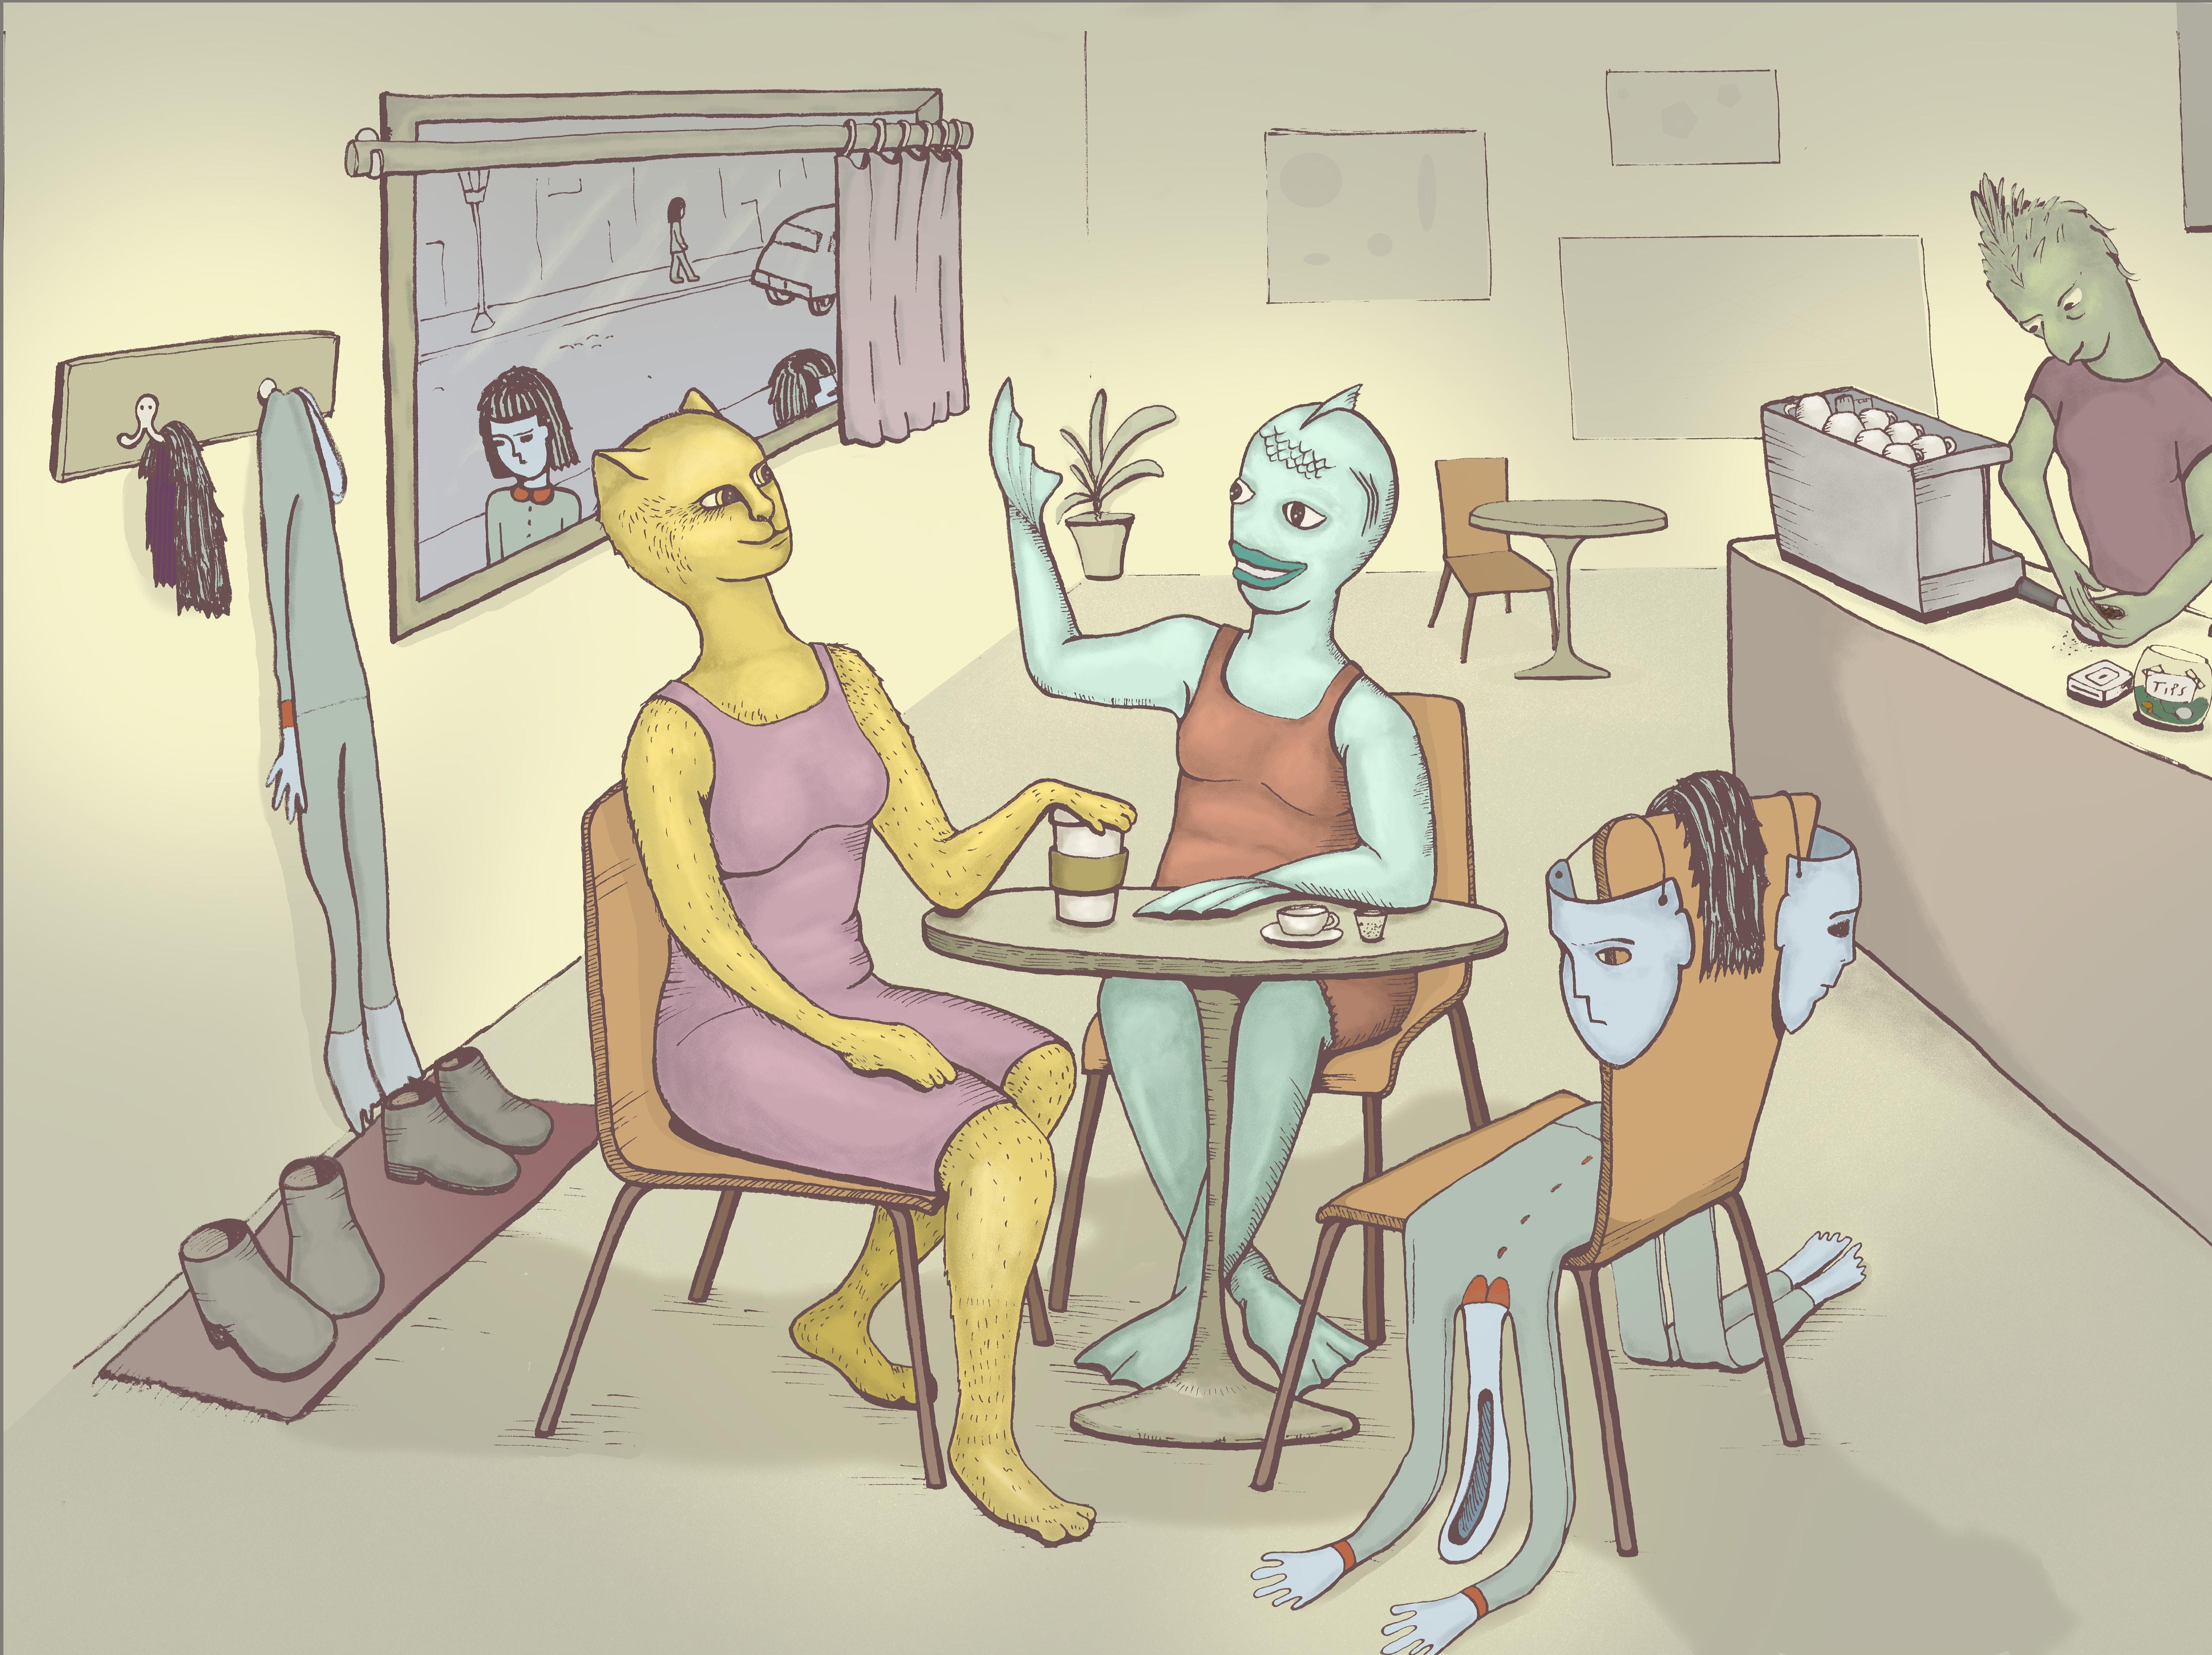 Coffee Shop with humanoids